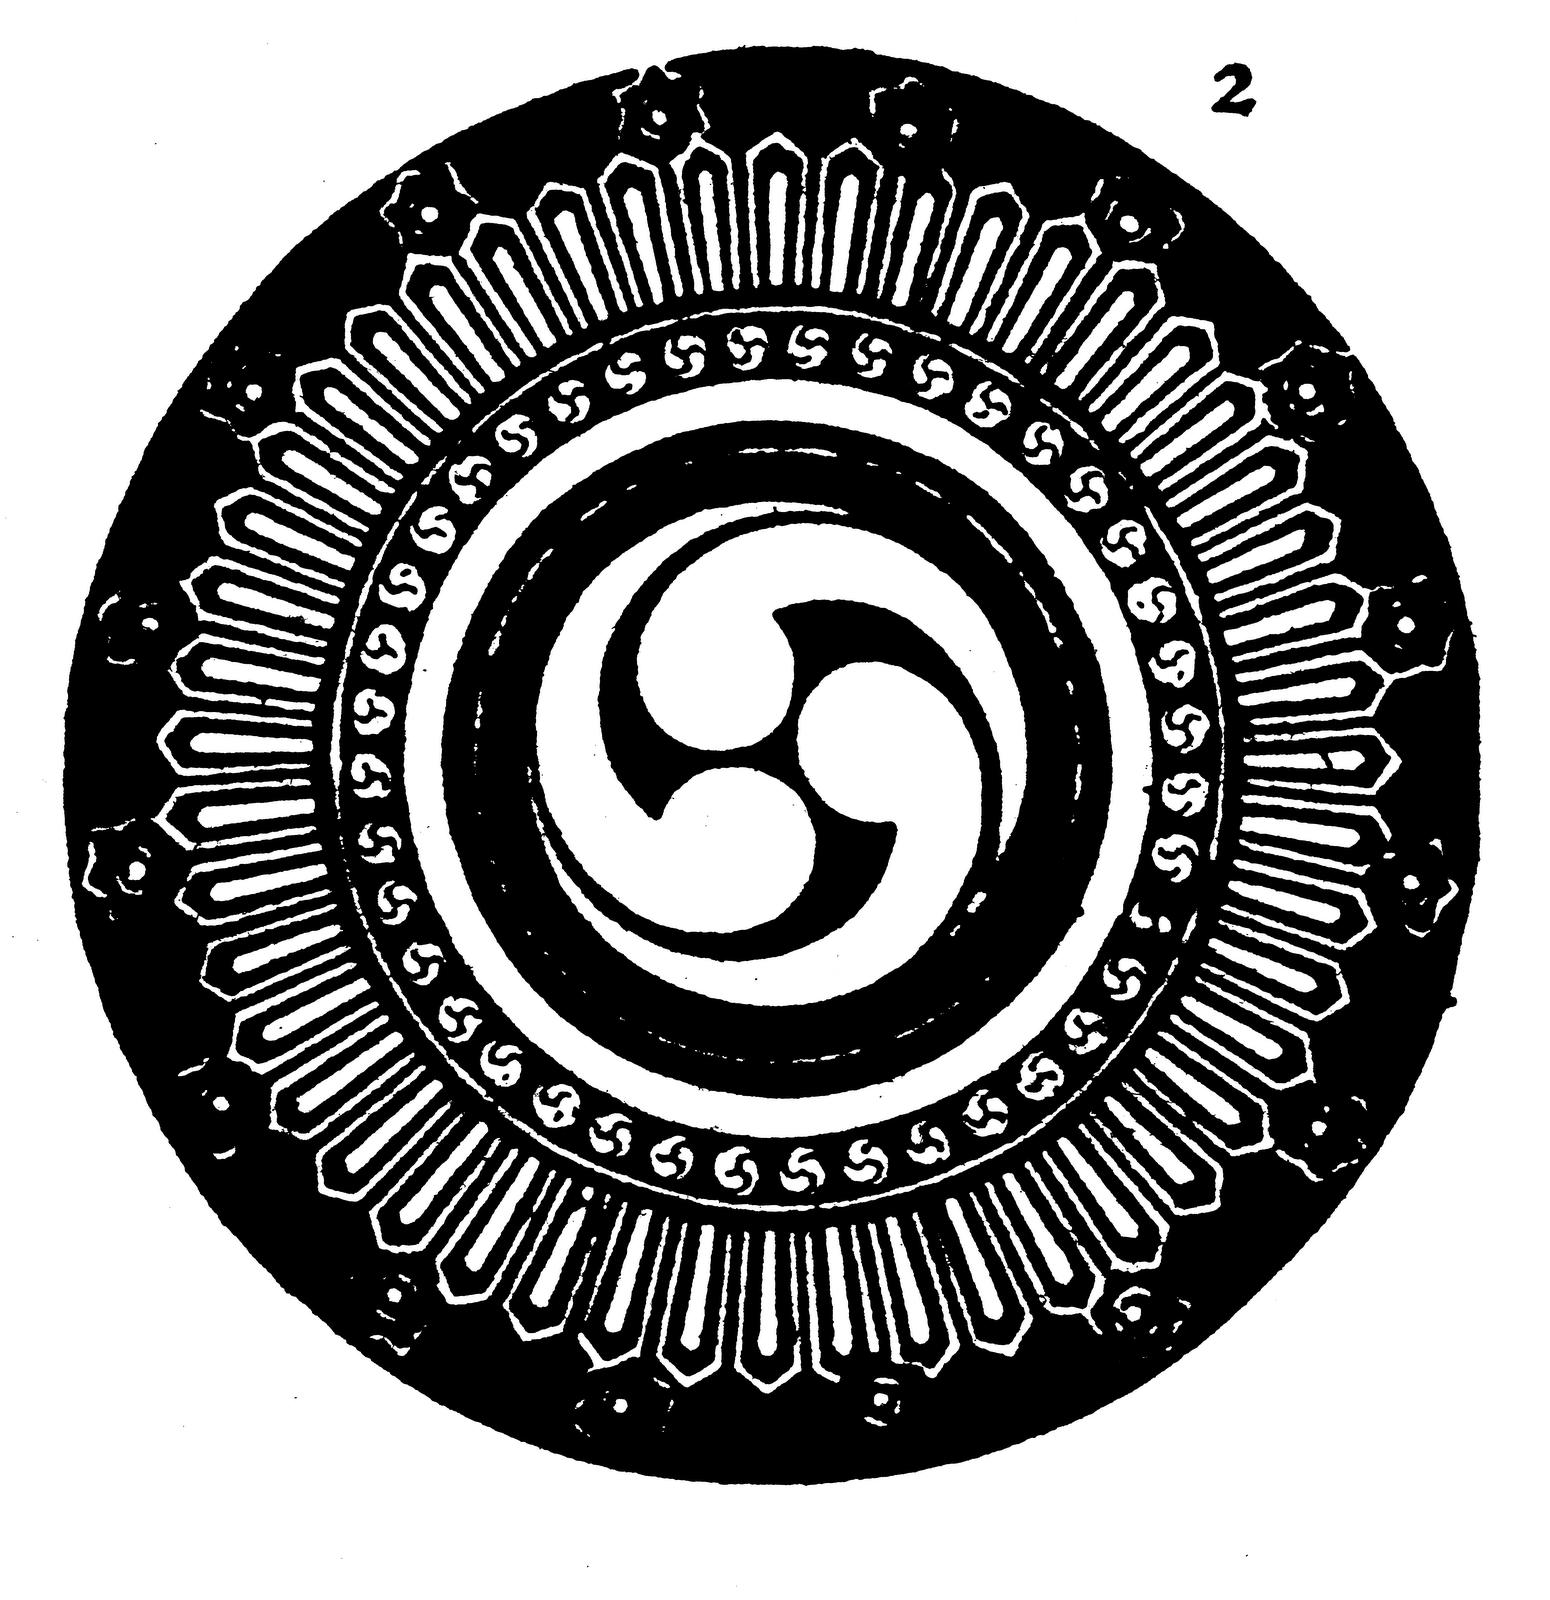 Japanese Buddhist Dharma Wheel Gif Image Dharma Wheel Tattoo Buddhism Buddhist Symbols Symbols